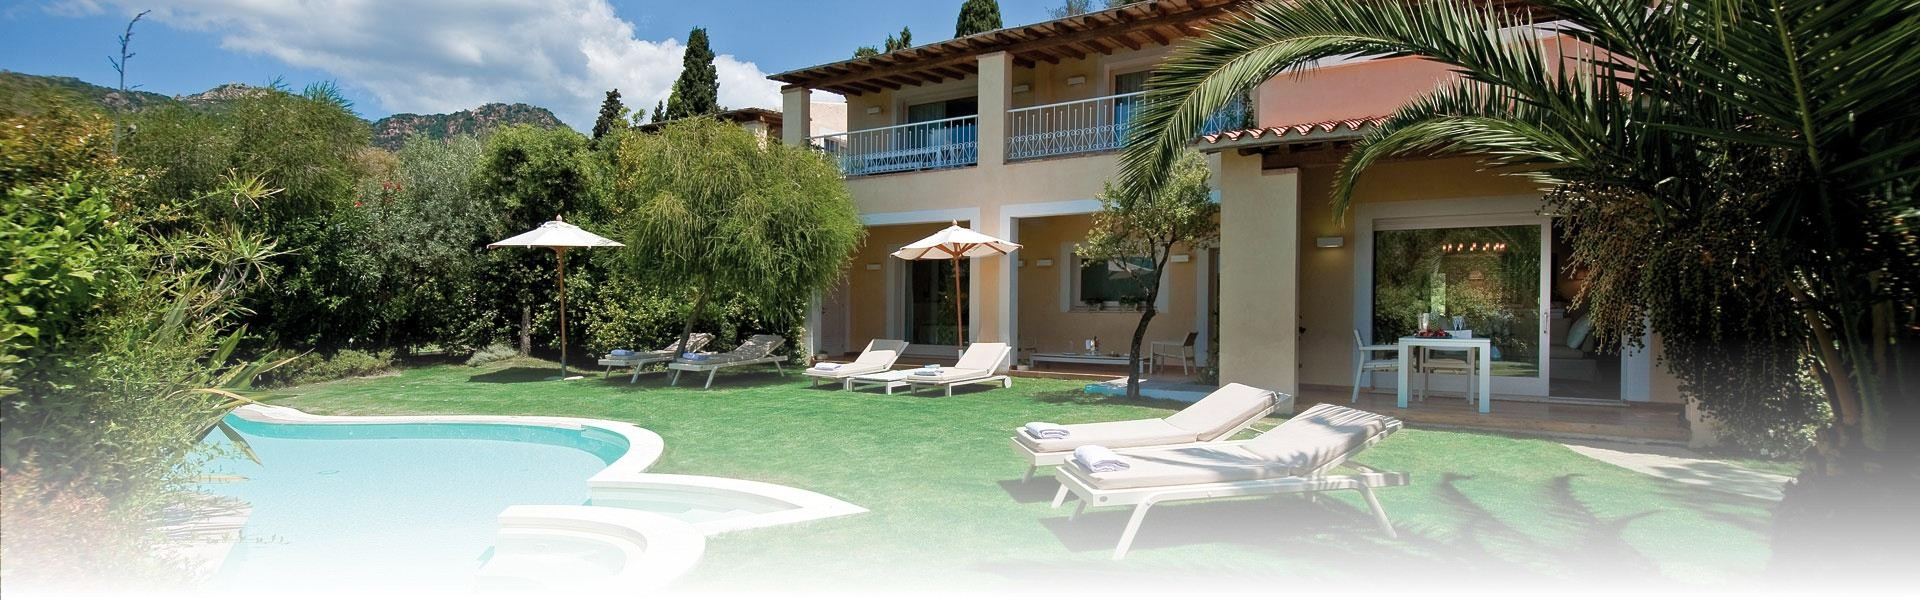 Luxury holidays in sardinia costa smeralda 5 star hotels for Best boutique hotels sardinia